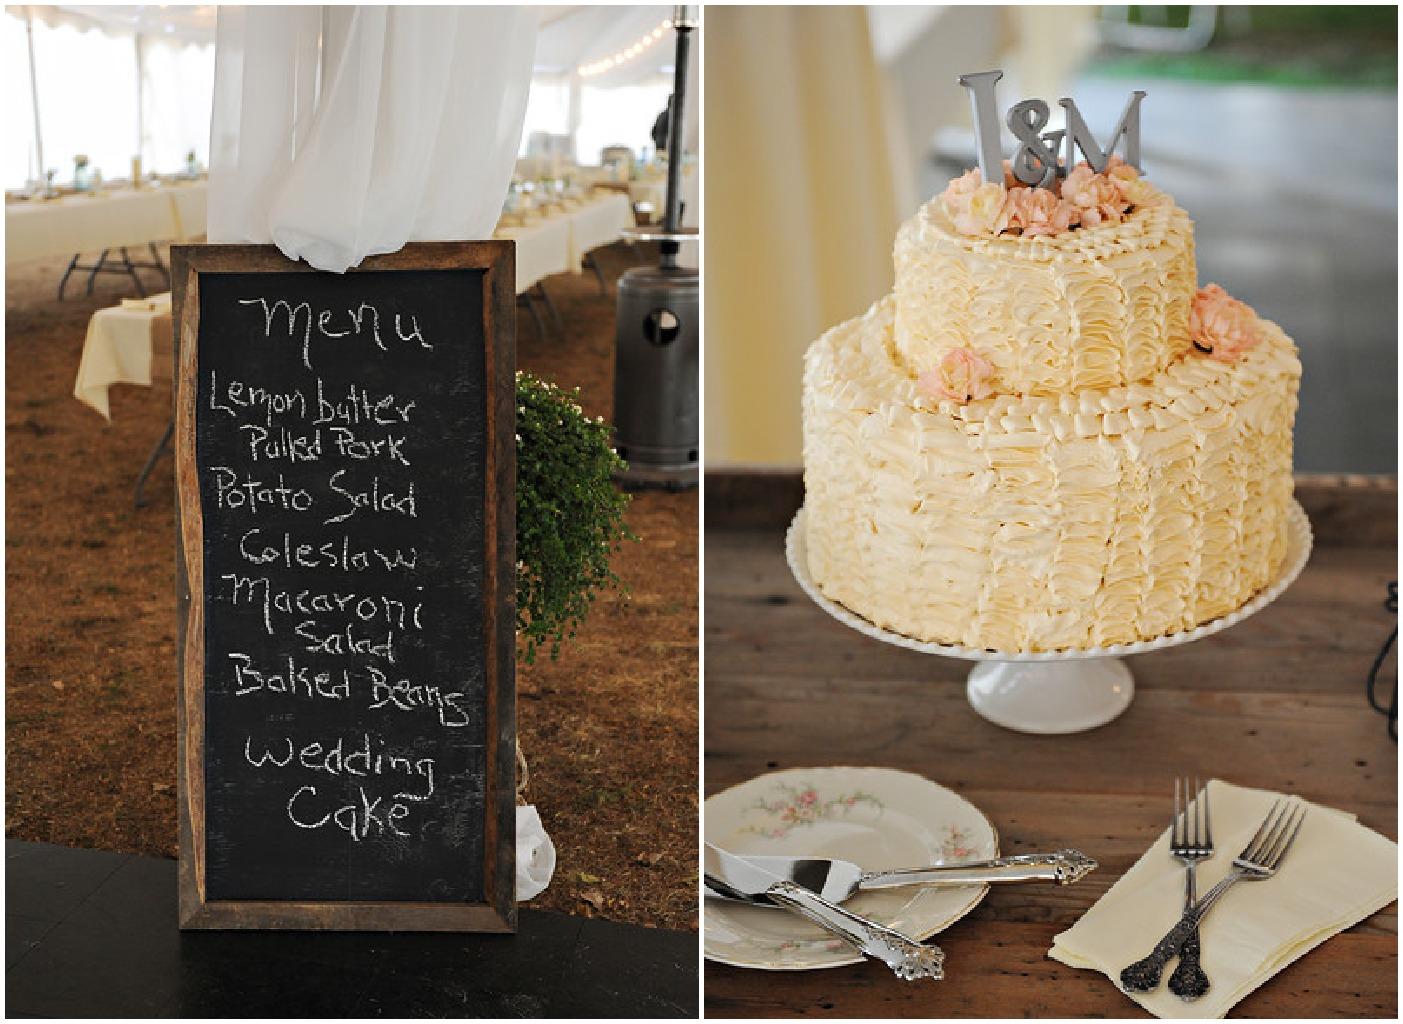 Pics s Cakes Wedding Cakes Vintage Rustic Fun1041